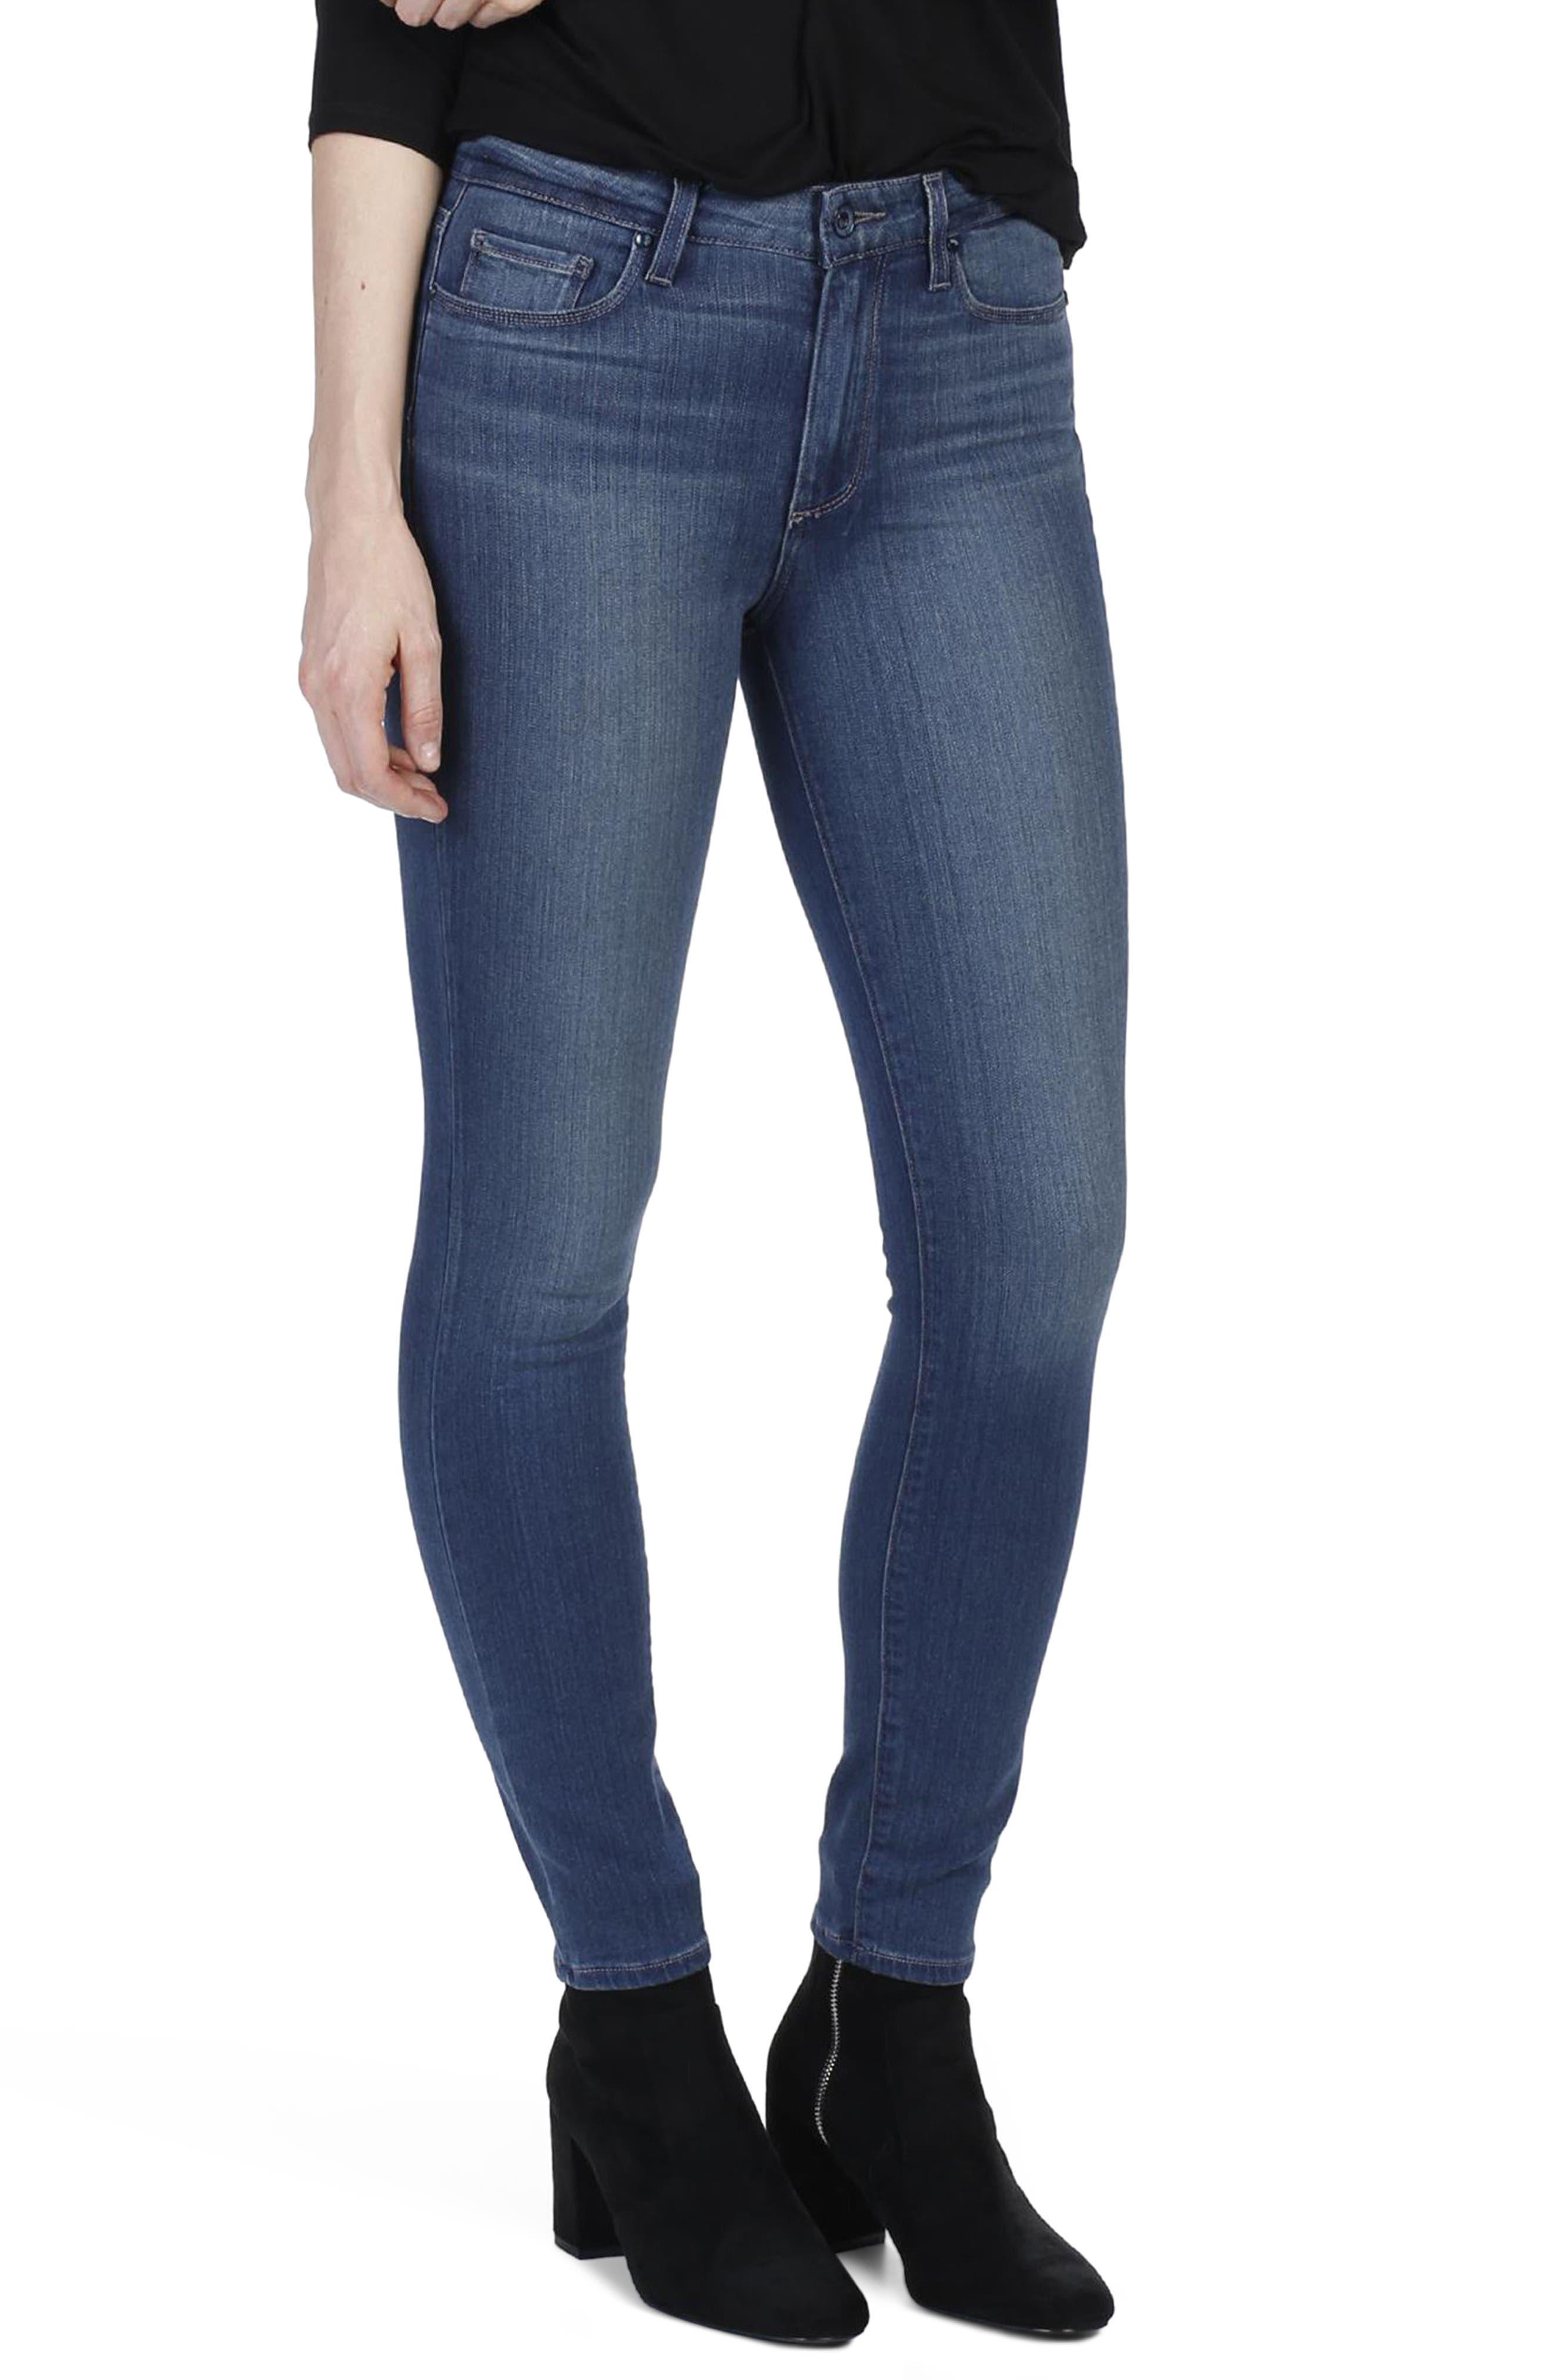 Transcend - Hoxton High Waist Ankle Skinny Jeans,                             Main thumbnail 1, color,                             Vida